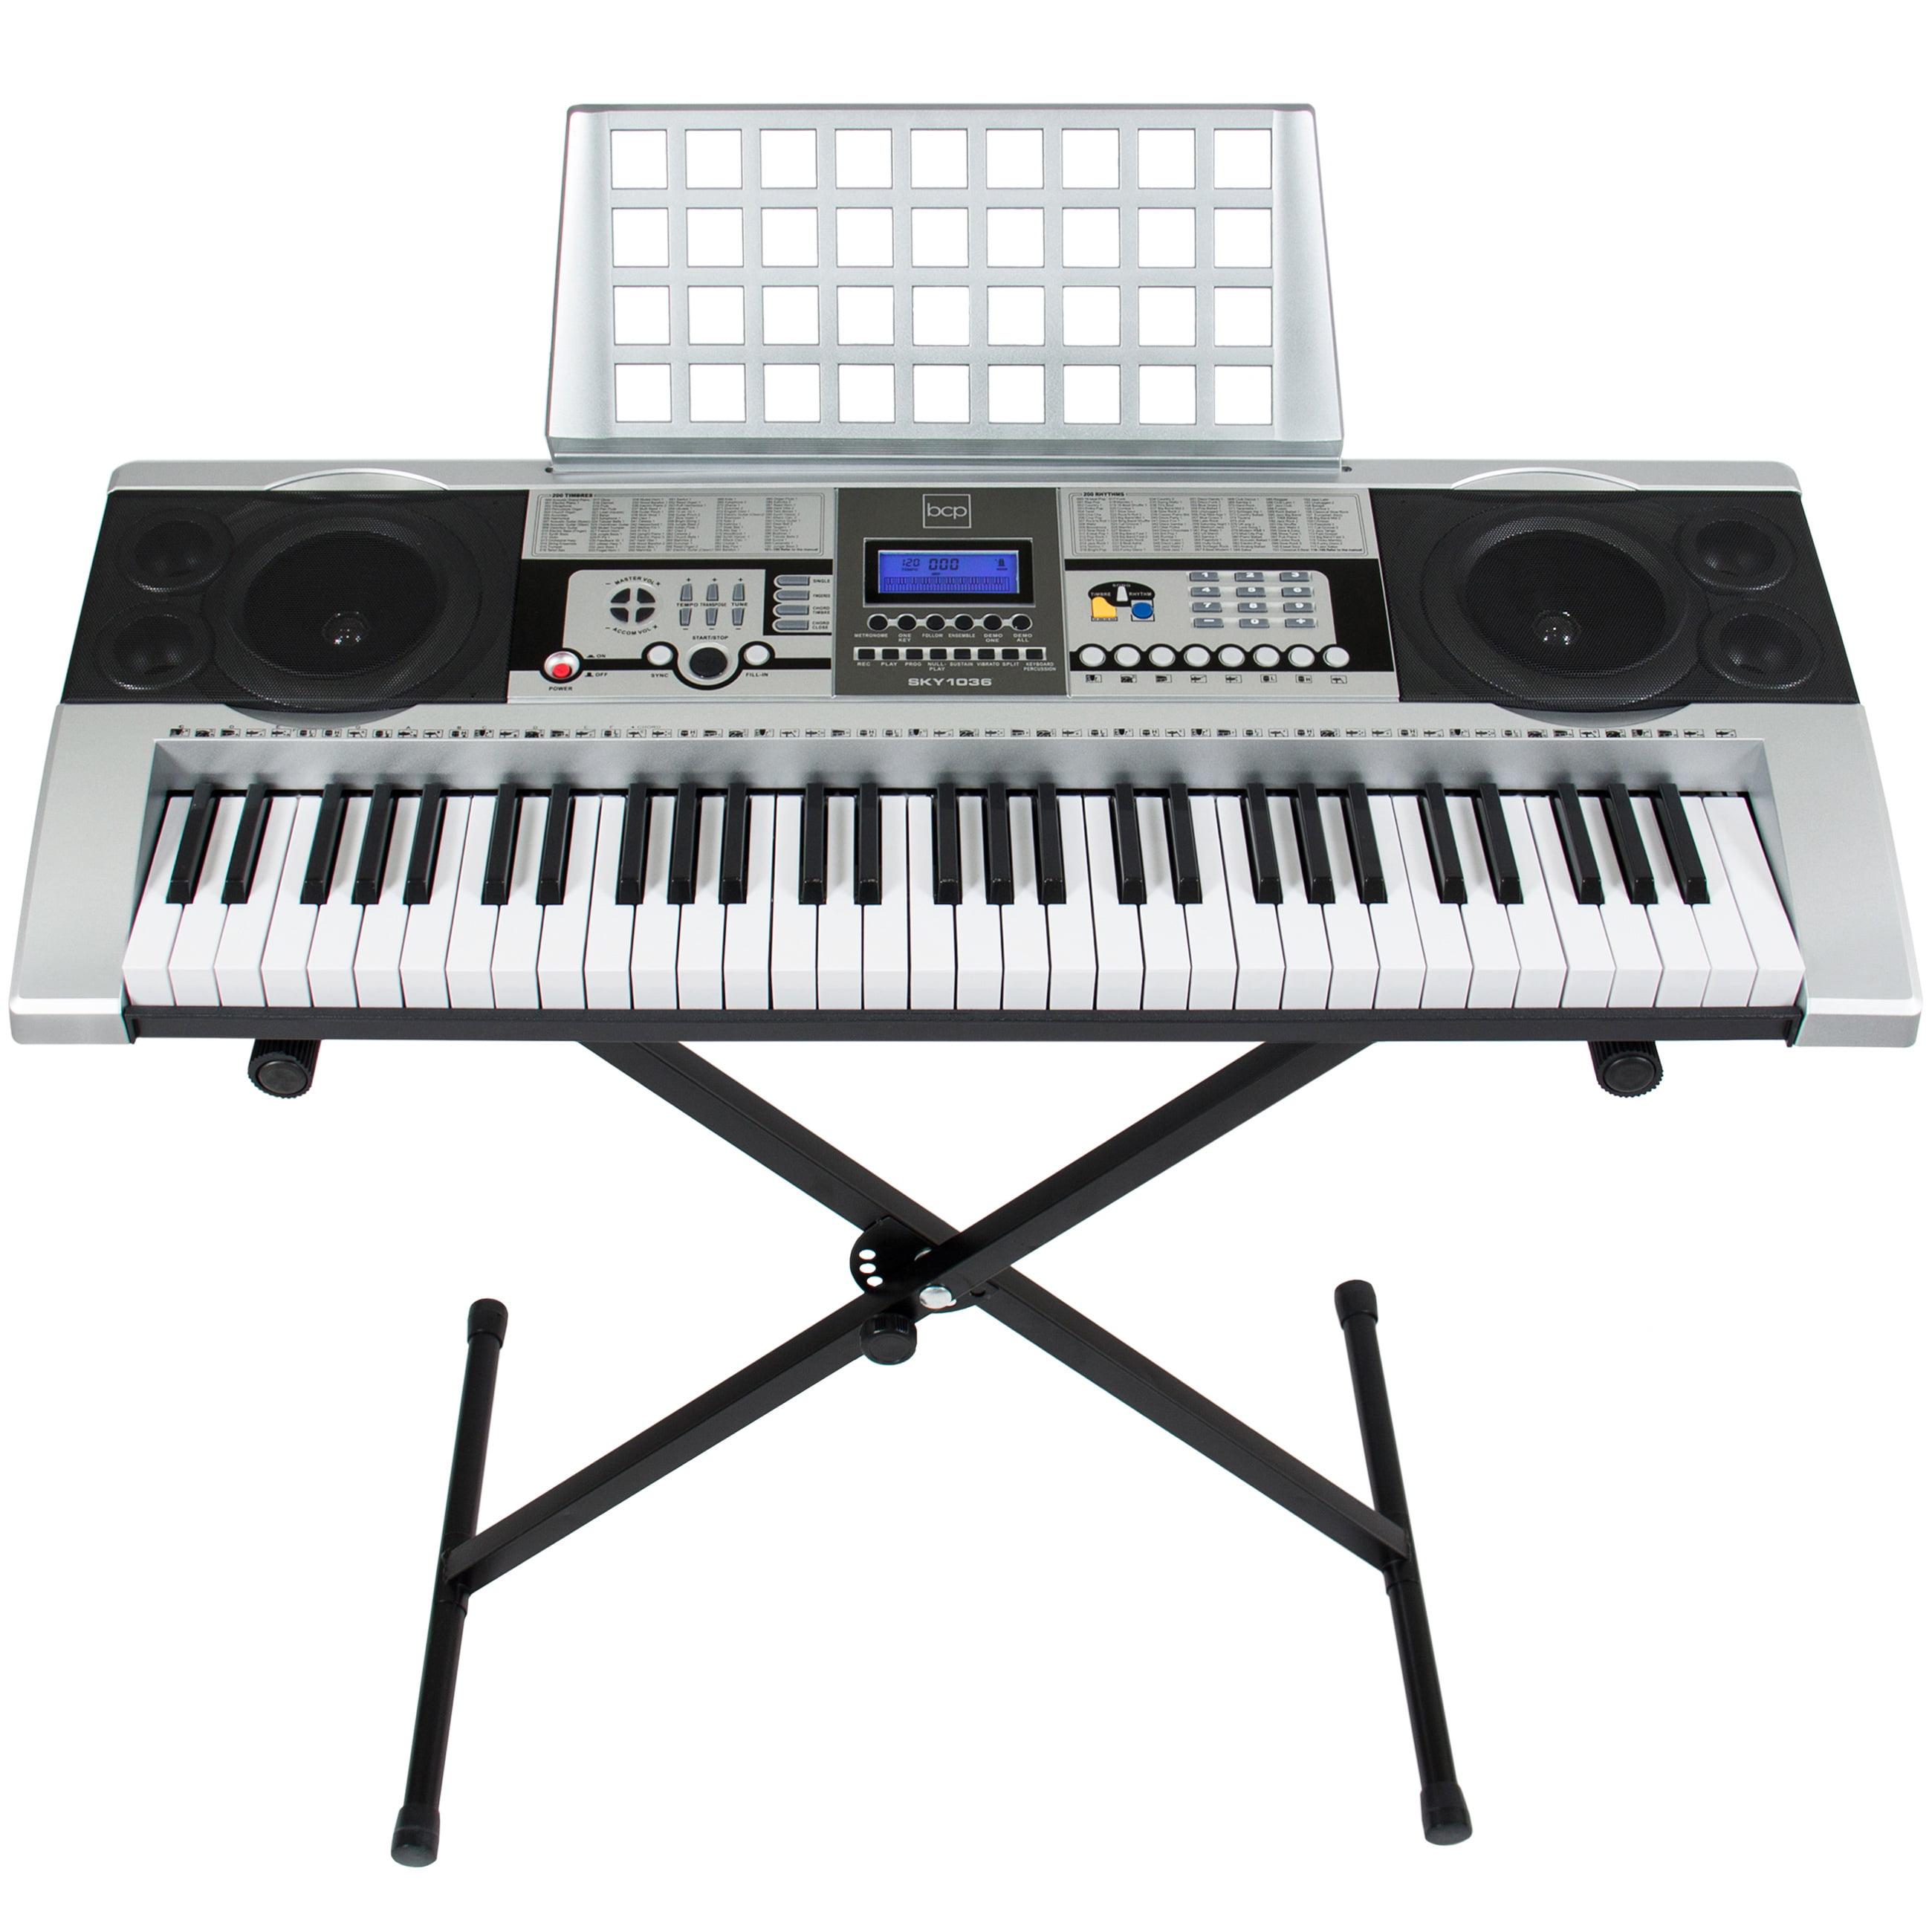 electronic piano keyboard 61 key music key board piano with x stand